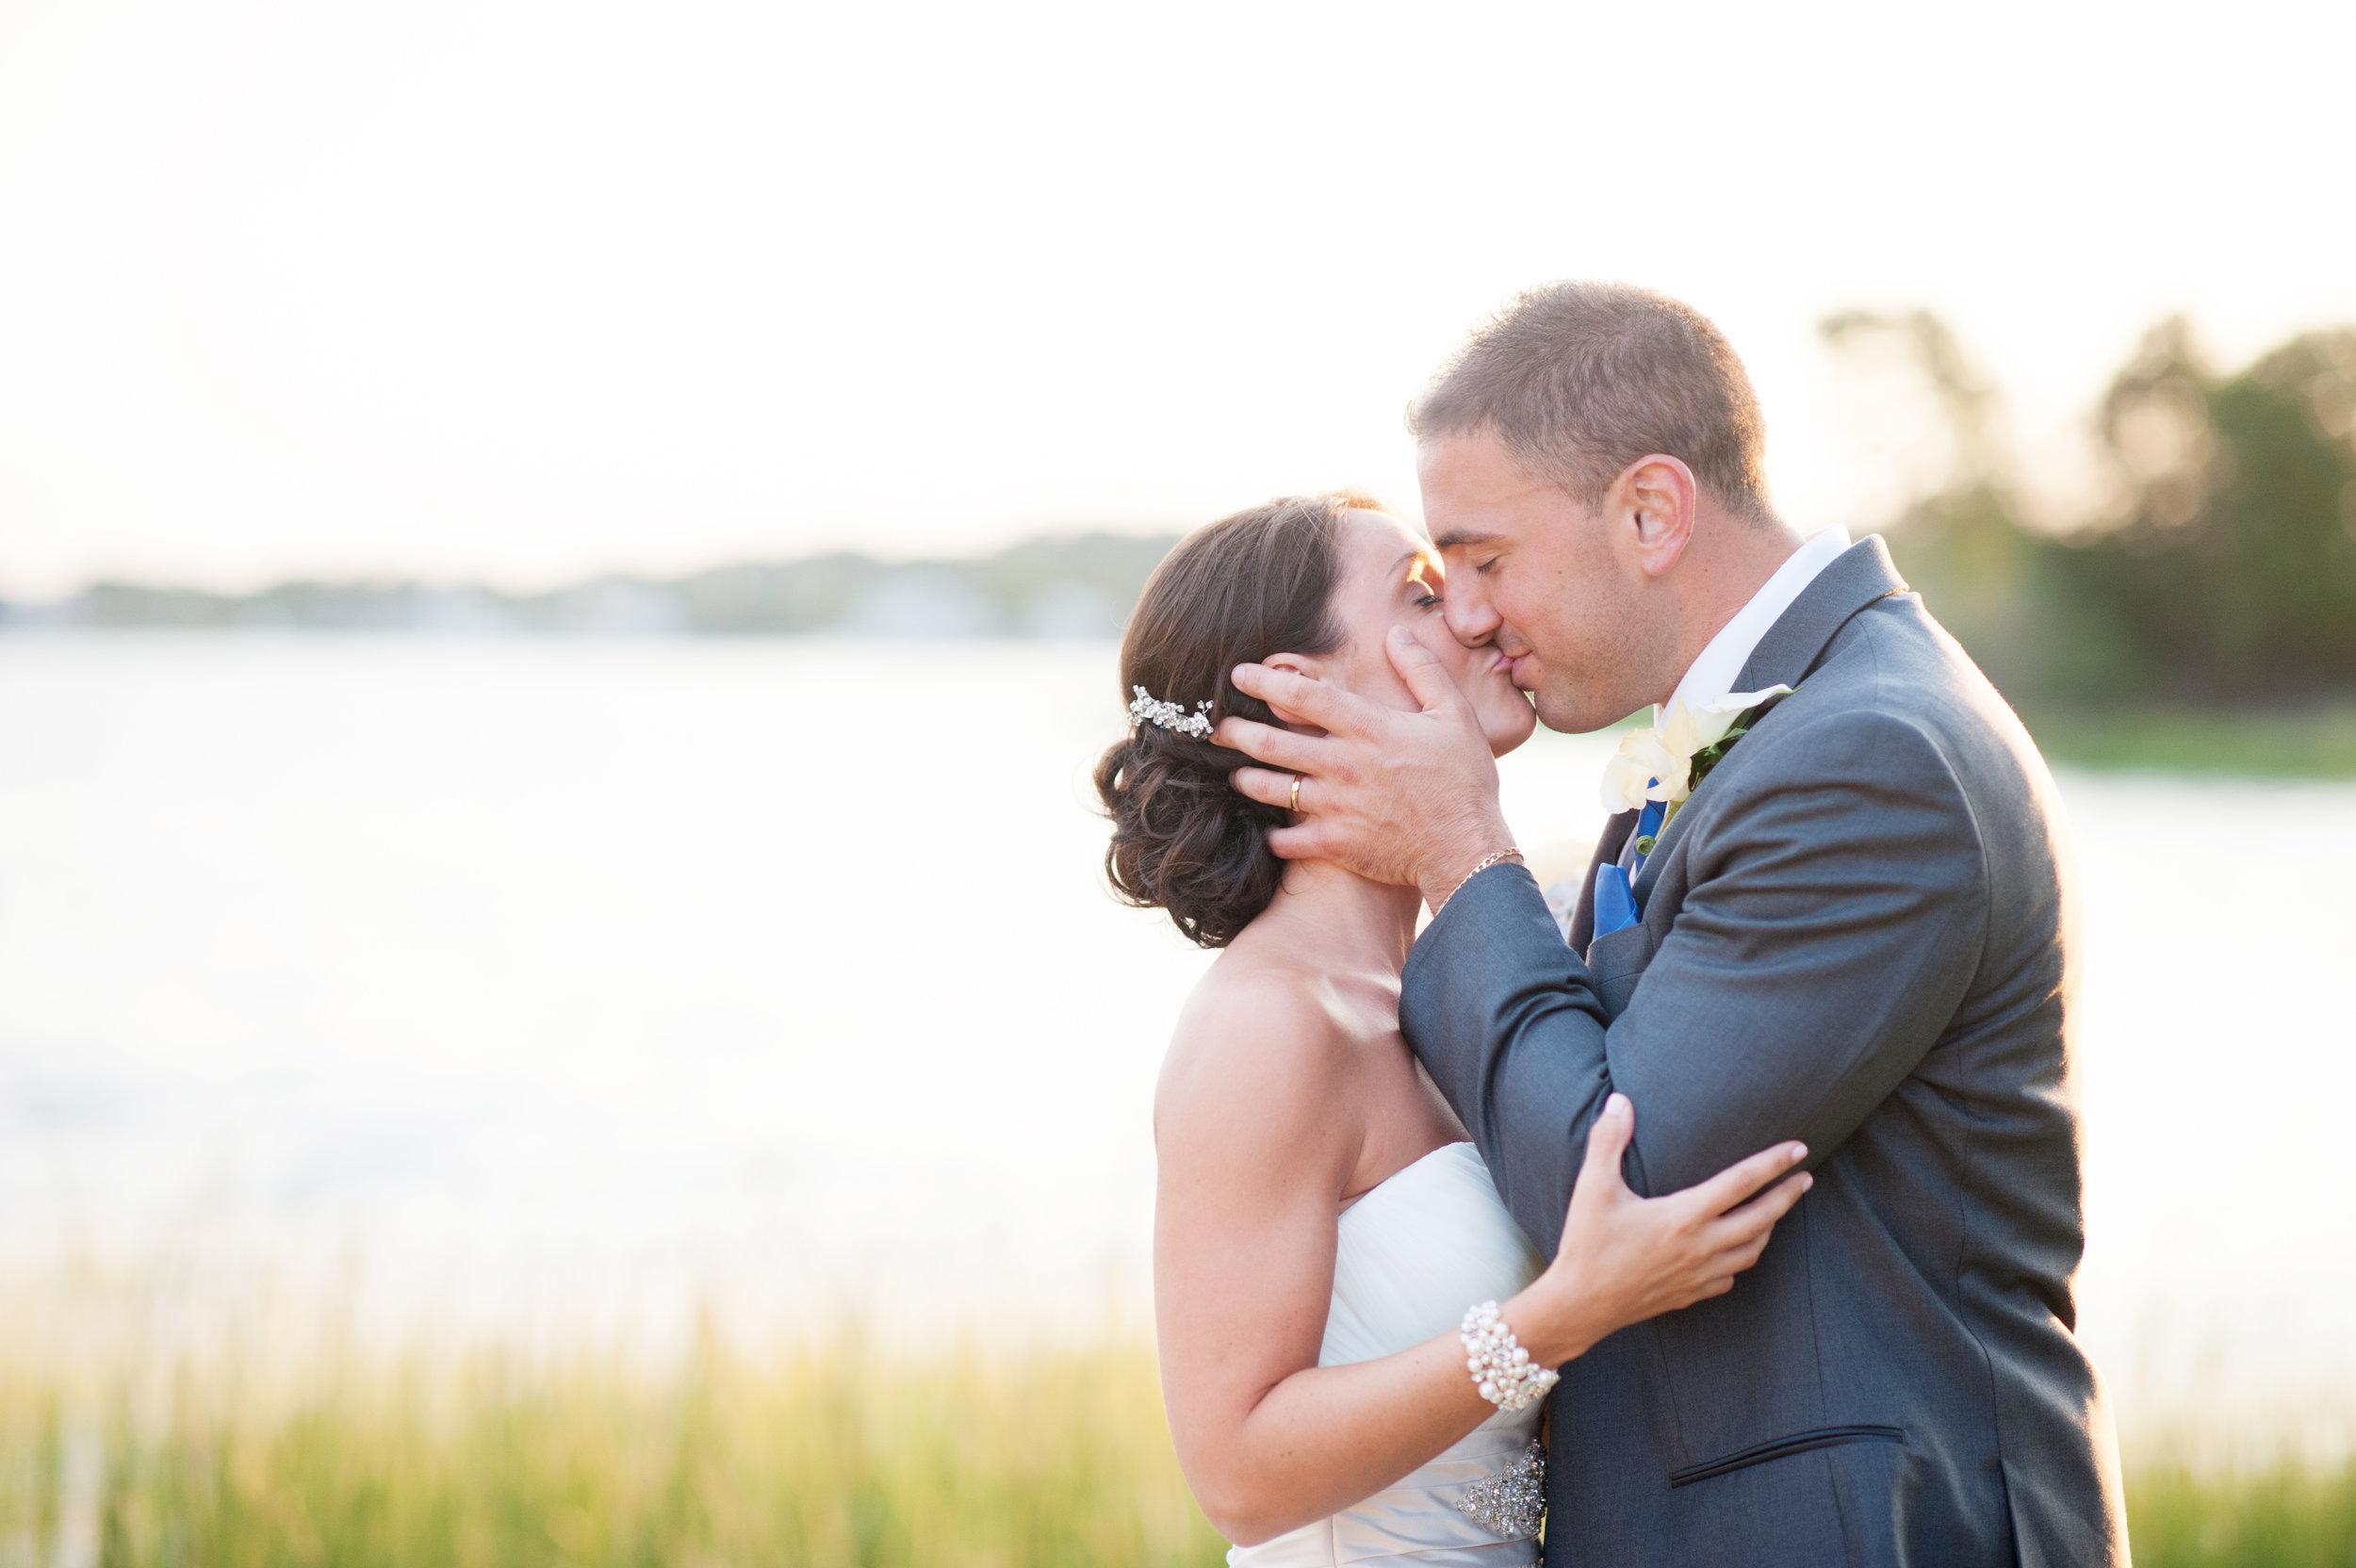 JAlviti_Photography_Weddings_Engagement_Proposal001.jpg